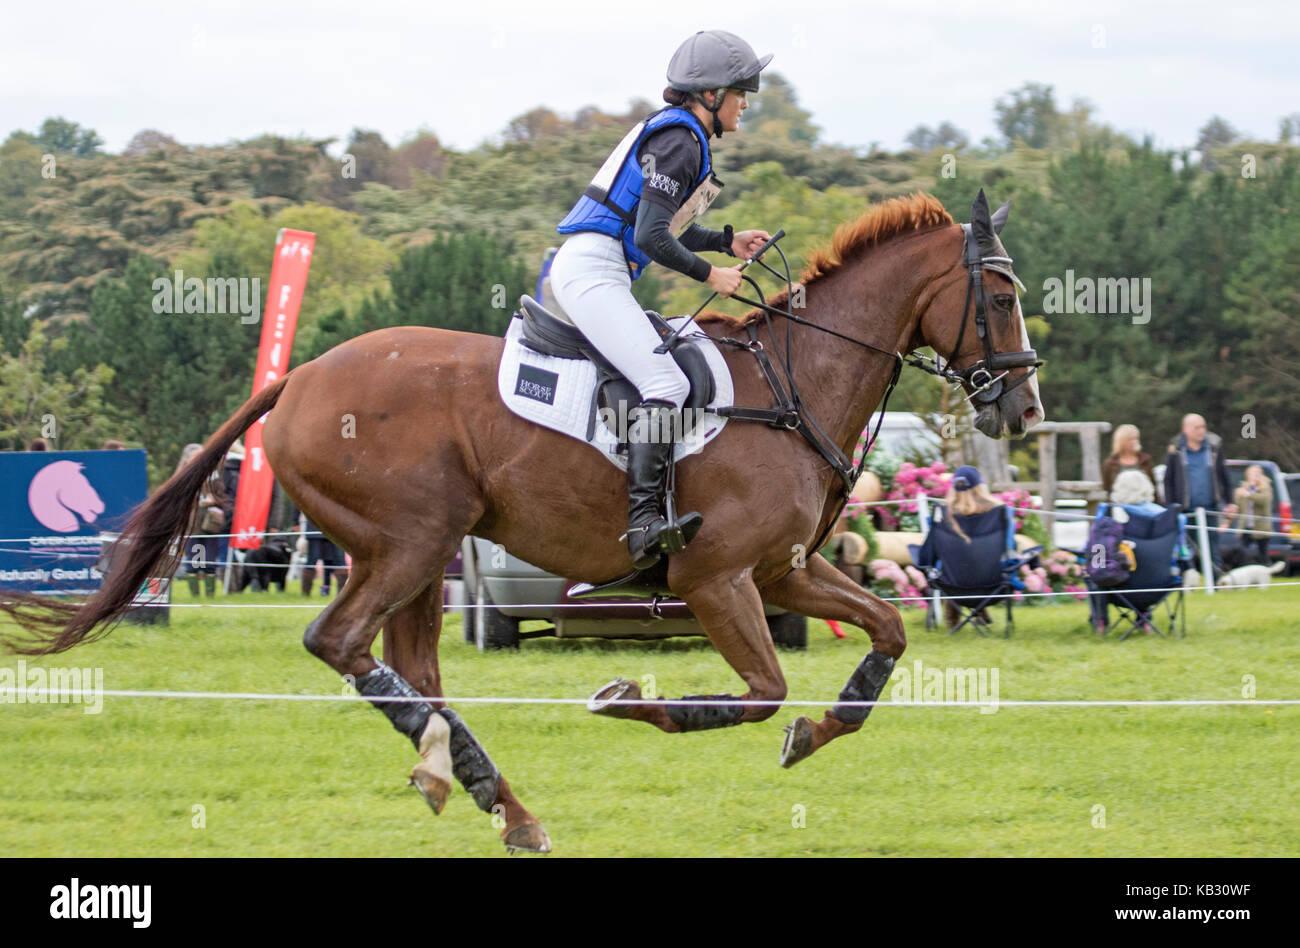 Lucienne Elms on MISTRALOU, SsangYong Blenheim Palace International Horse Trials 16th September 2017 - Stock Image